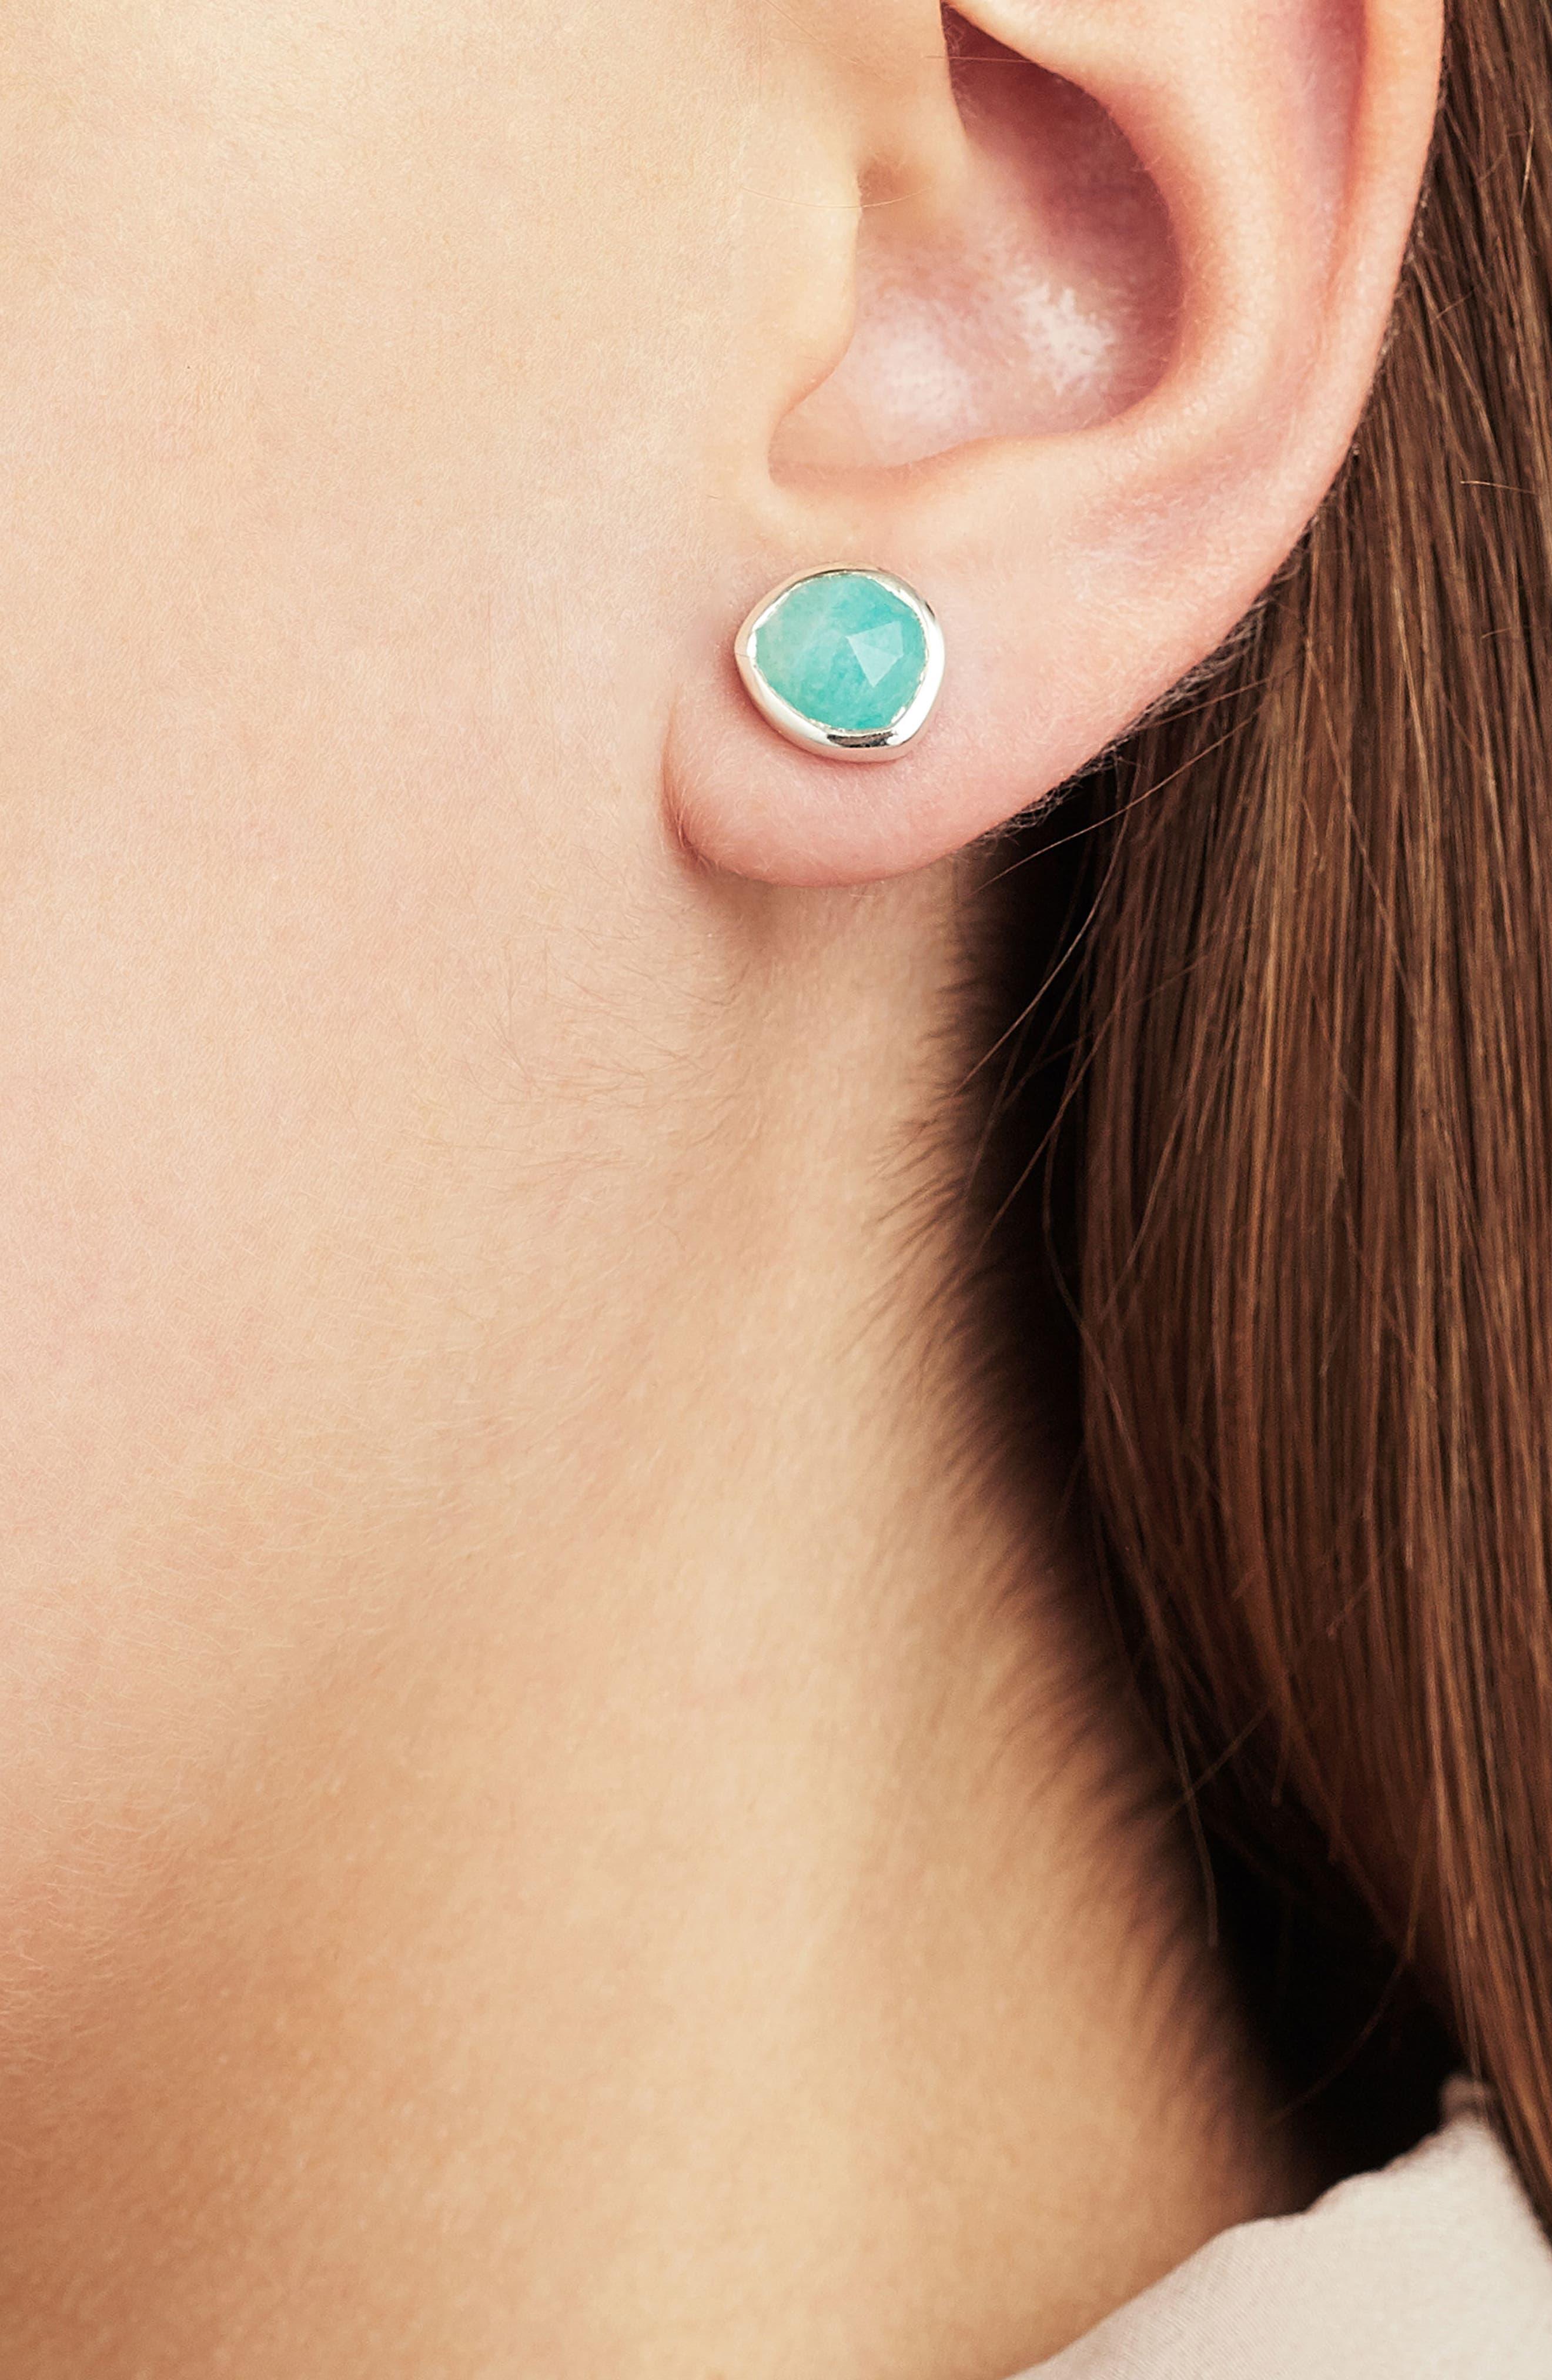 Siren Stud Earrings,                             Alternate thumbnail 2, color,                             SILVER/ AMAZONITE